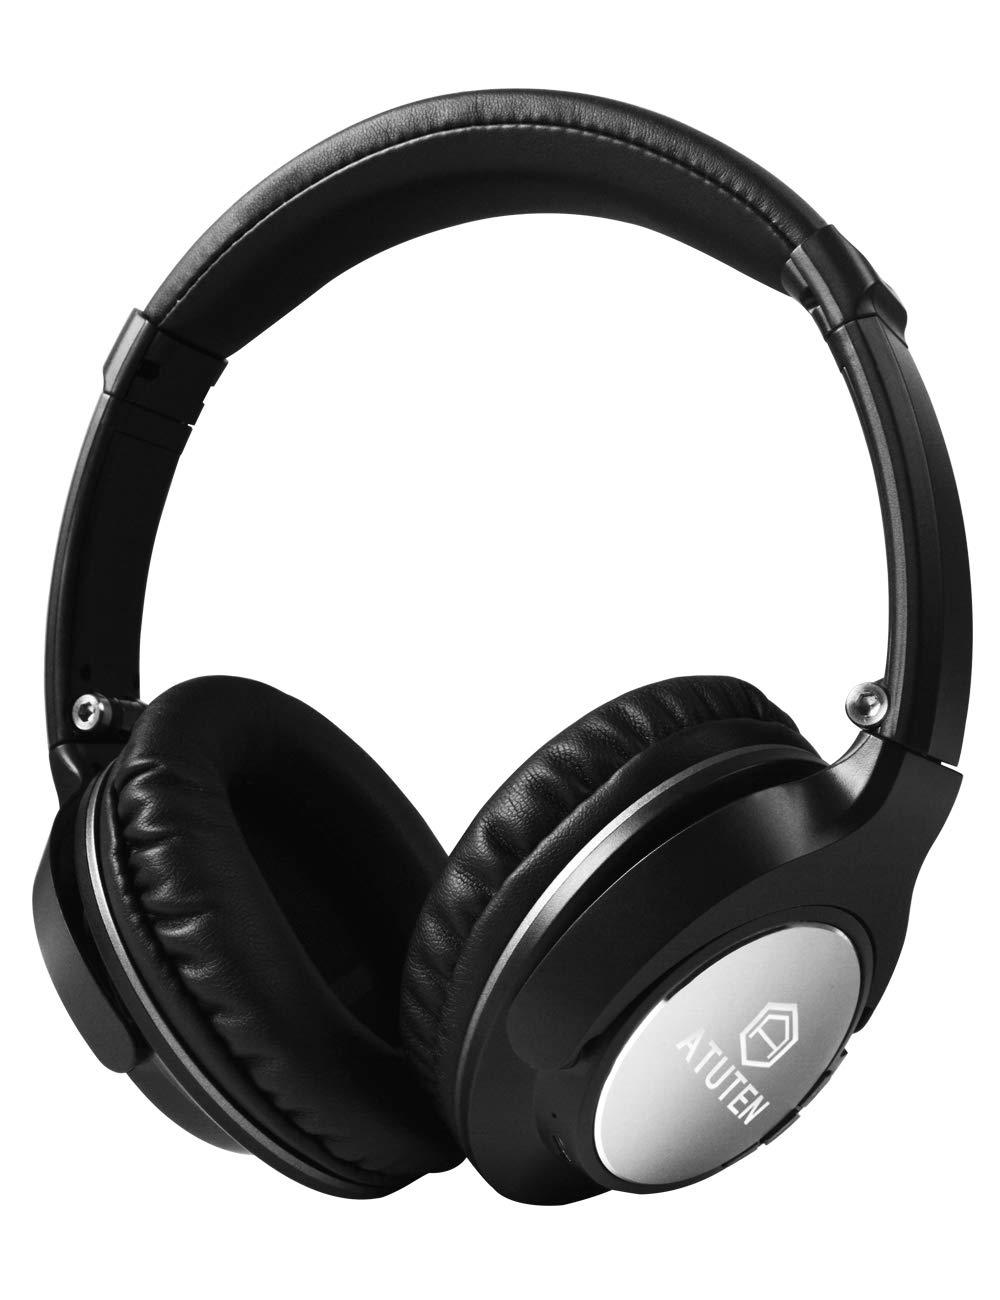 Bluetooth Over-Ear Kopfhö rer - Atuten Kabellos Faltbare Ohrhö rer Stereo Gaming Headphone mit Mikrofon fü r Alle Gerä te mit Bluetooth/3.5mm Klinkenstecker - Kompatibel mit IOS Android